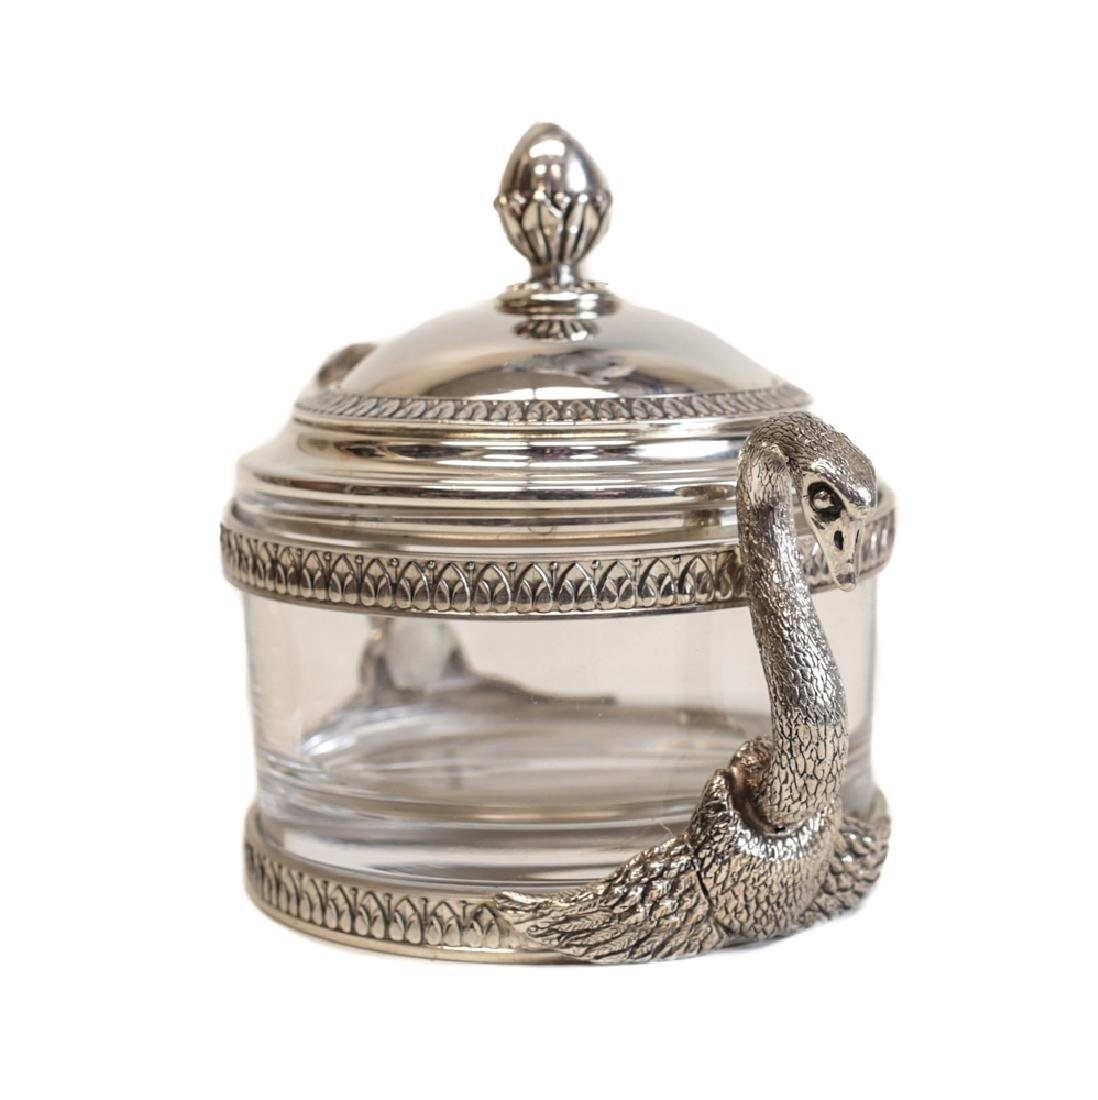 Swan Form Silver & Glass Jar by Gianmaria Buccellati - 3